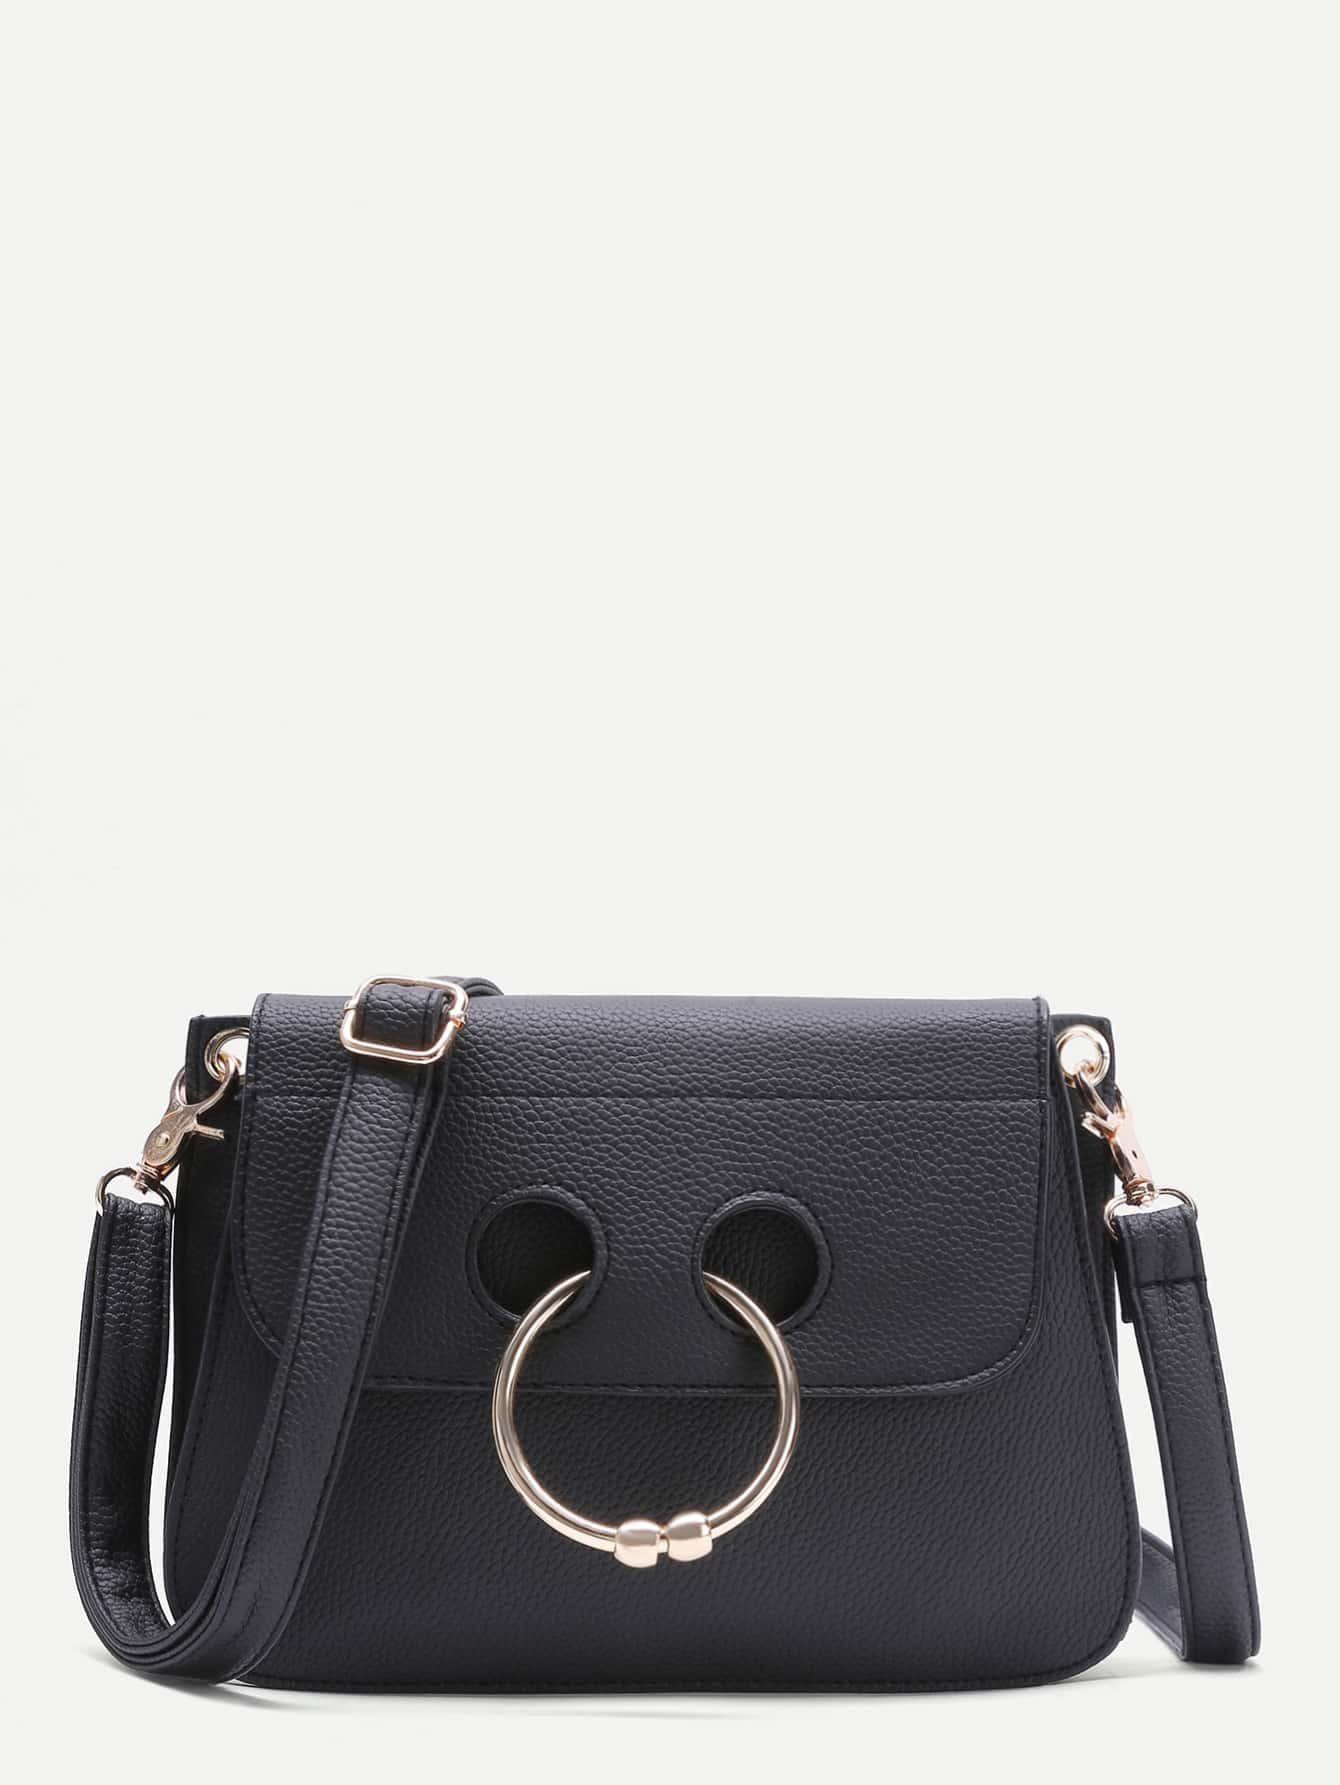 098b01aec Cheap Black Pebbled Leather Nose Ring Flap Shoulder Bag for sale Australia  | SHEIN